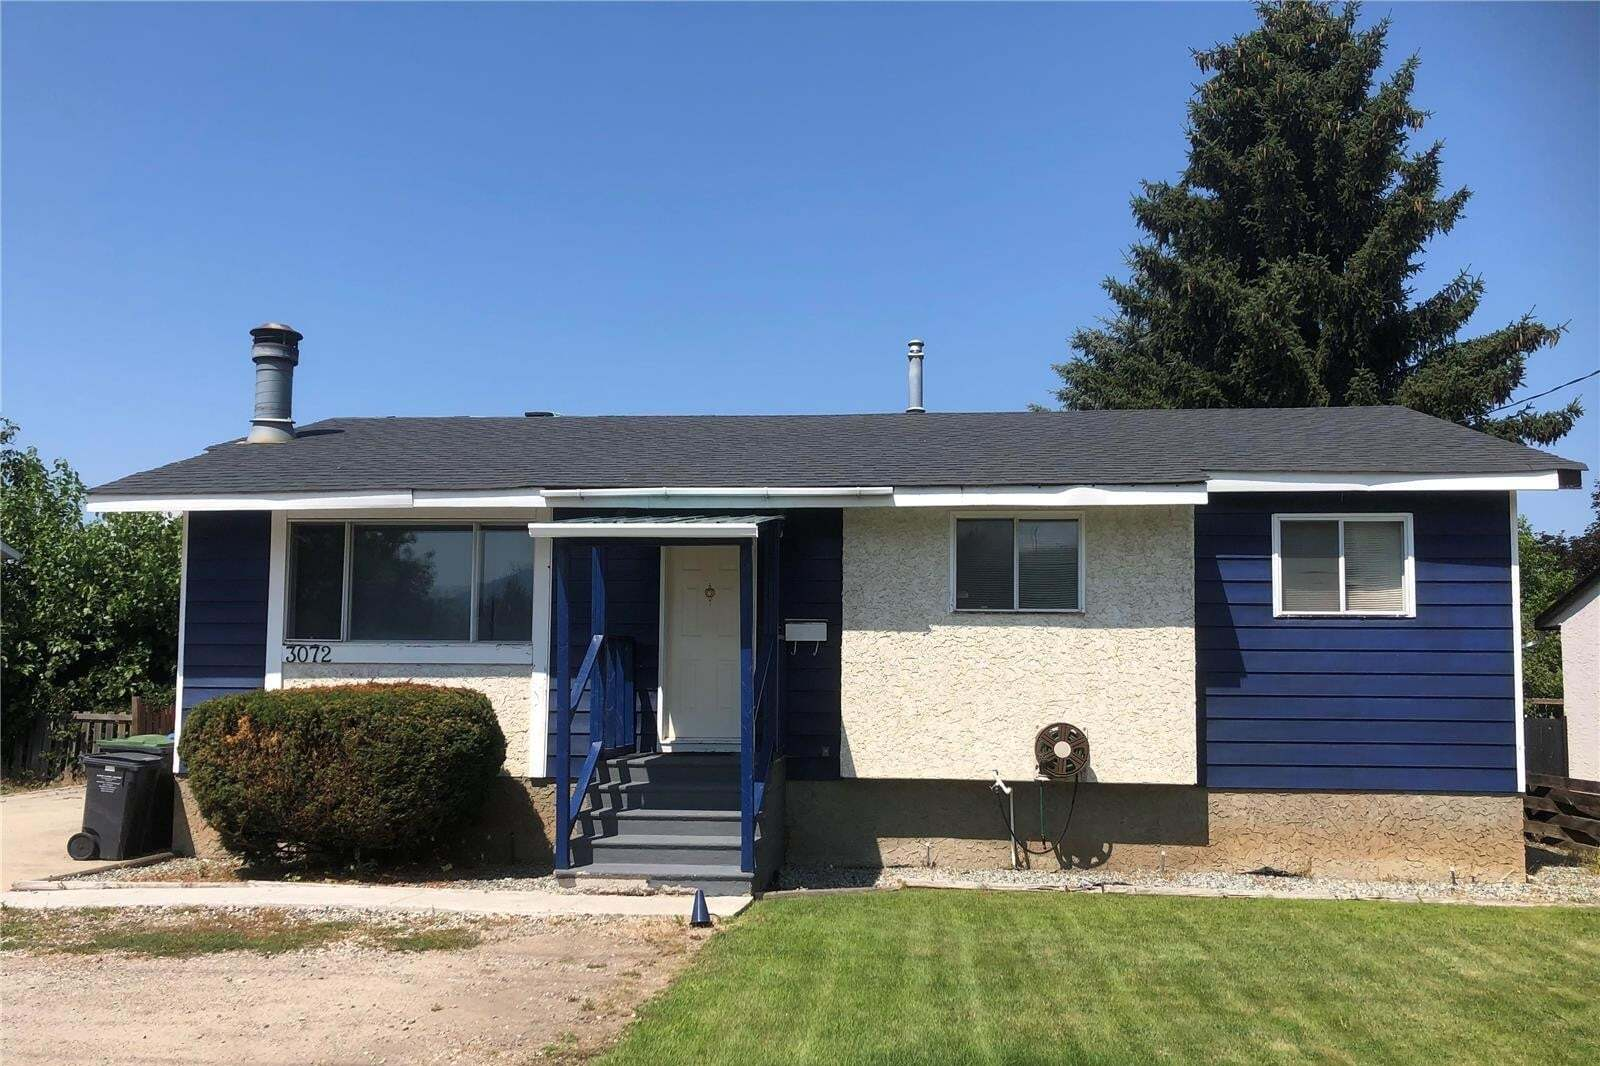 House for sale at 3072 Springfield Rd Kelowna British Columbia - MLS: 10204826